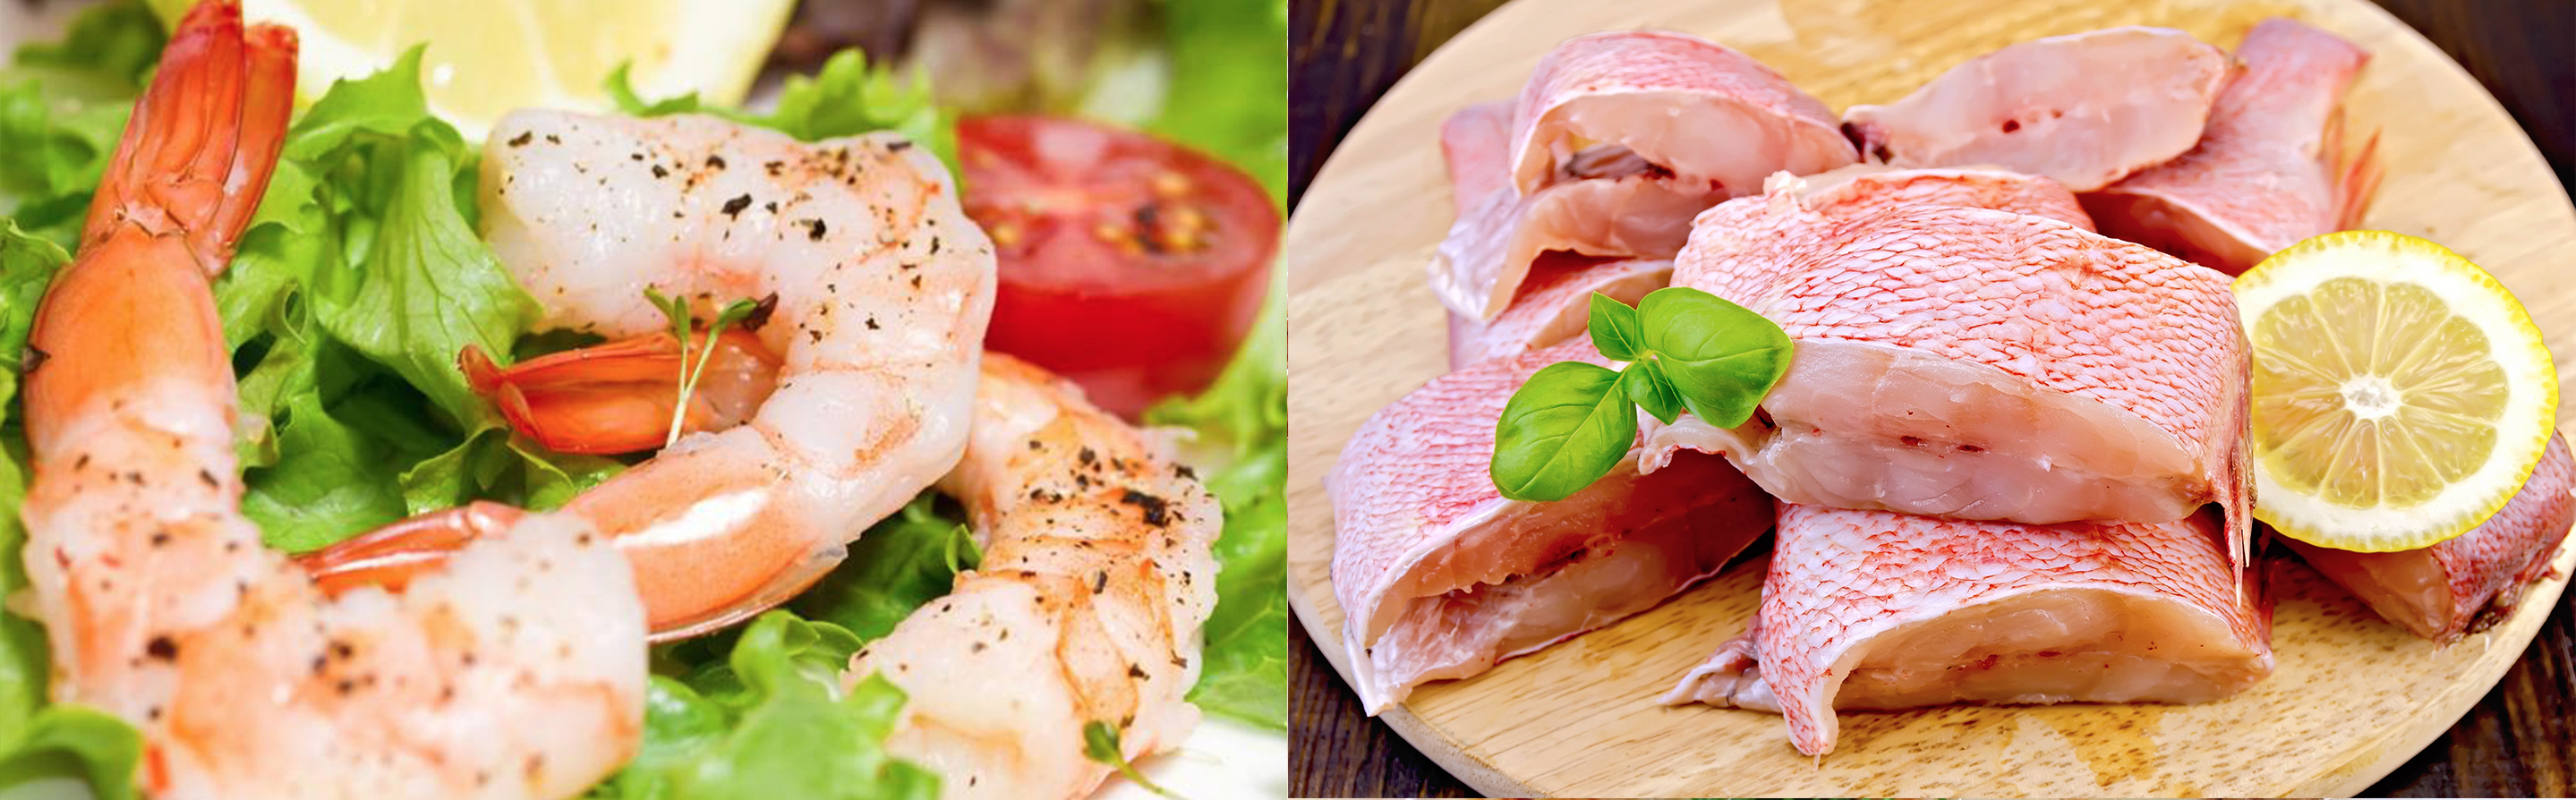 sanibel-seafood-timbers-restaurant-mangrove-snapper-slider-P-copy